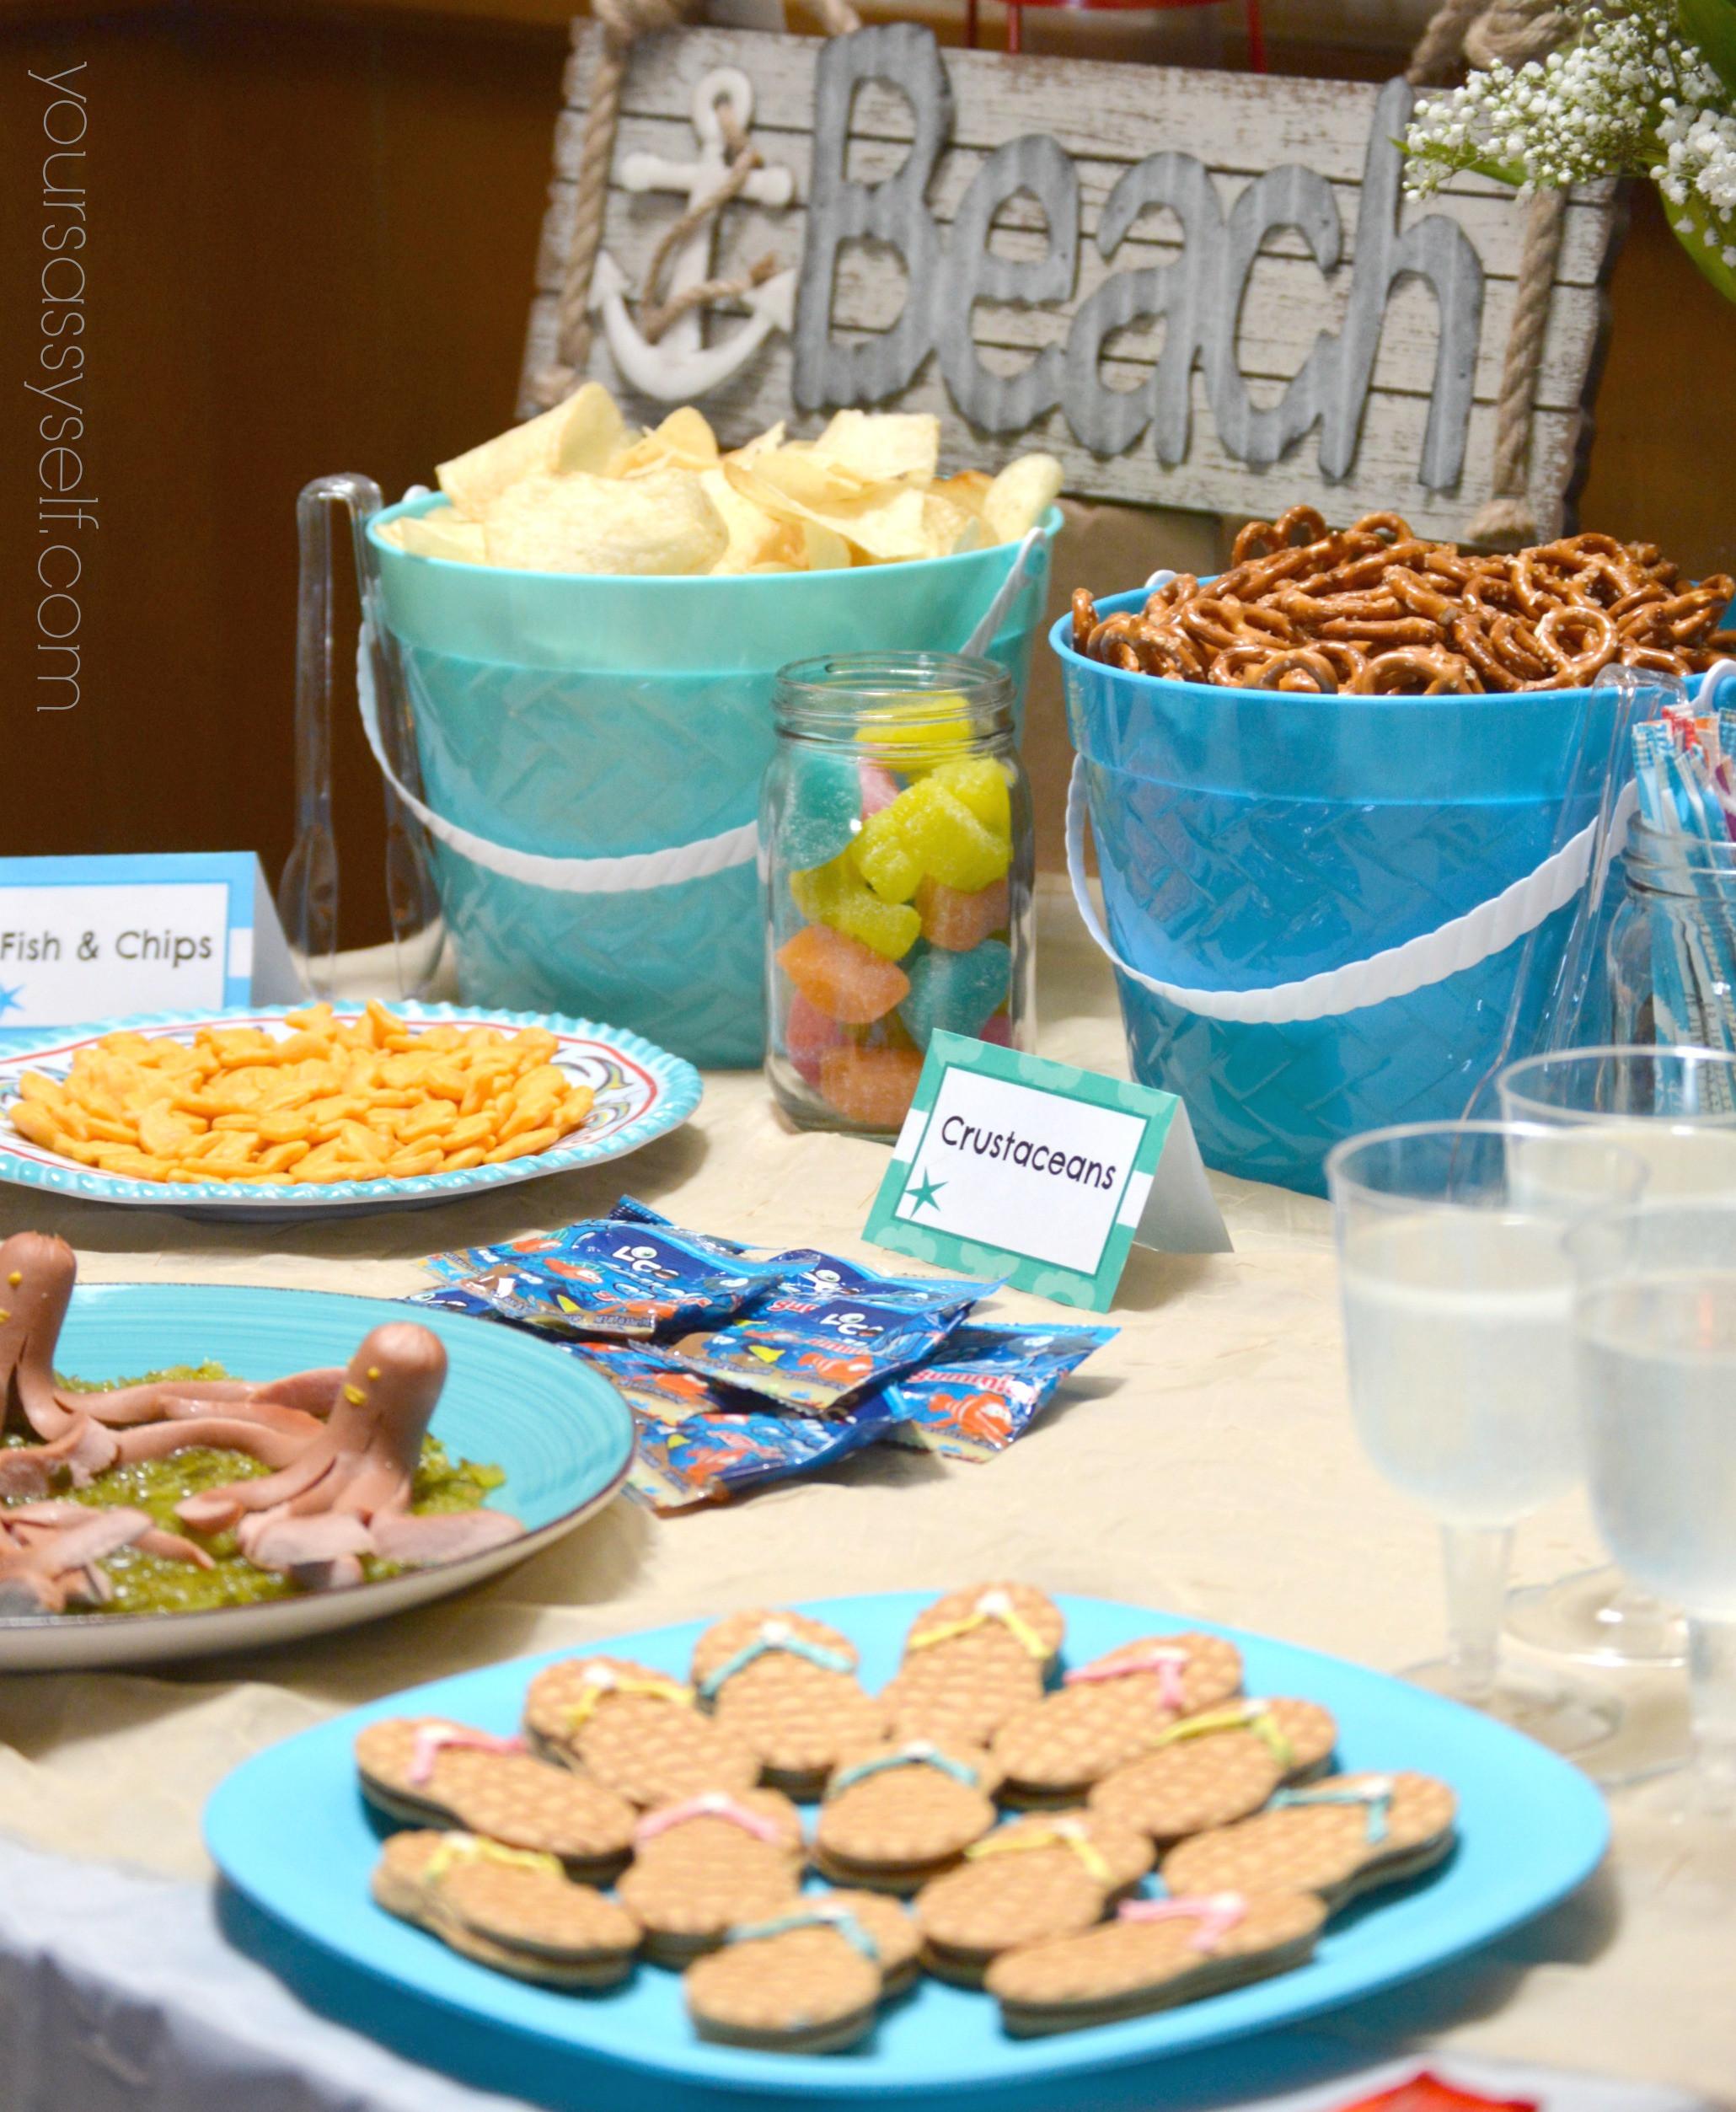 Ideas For A Beach Theme Party  Fun Birthday Beach Party Ideas For Any Age Your Sassy Self